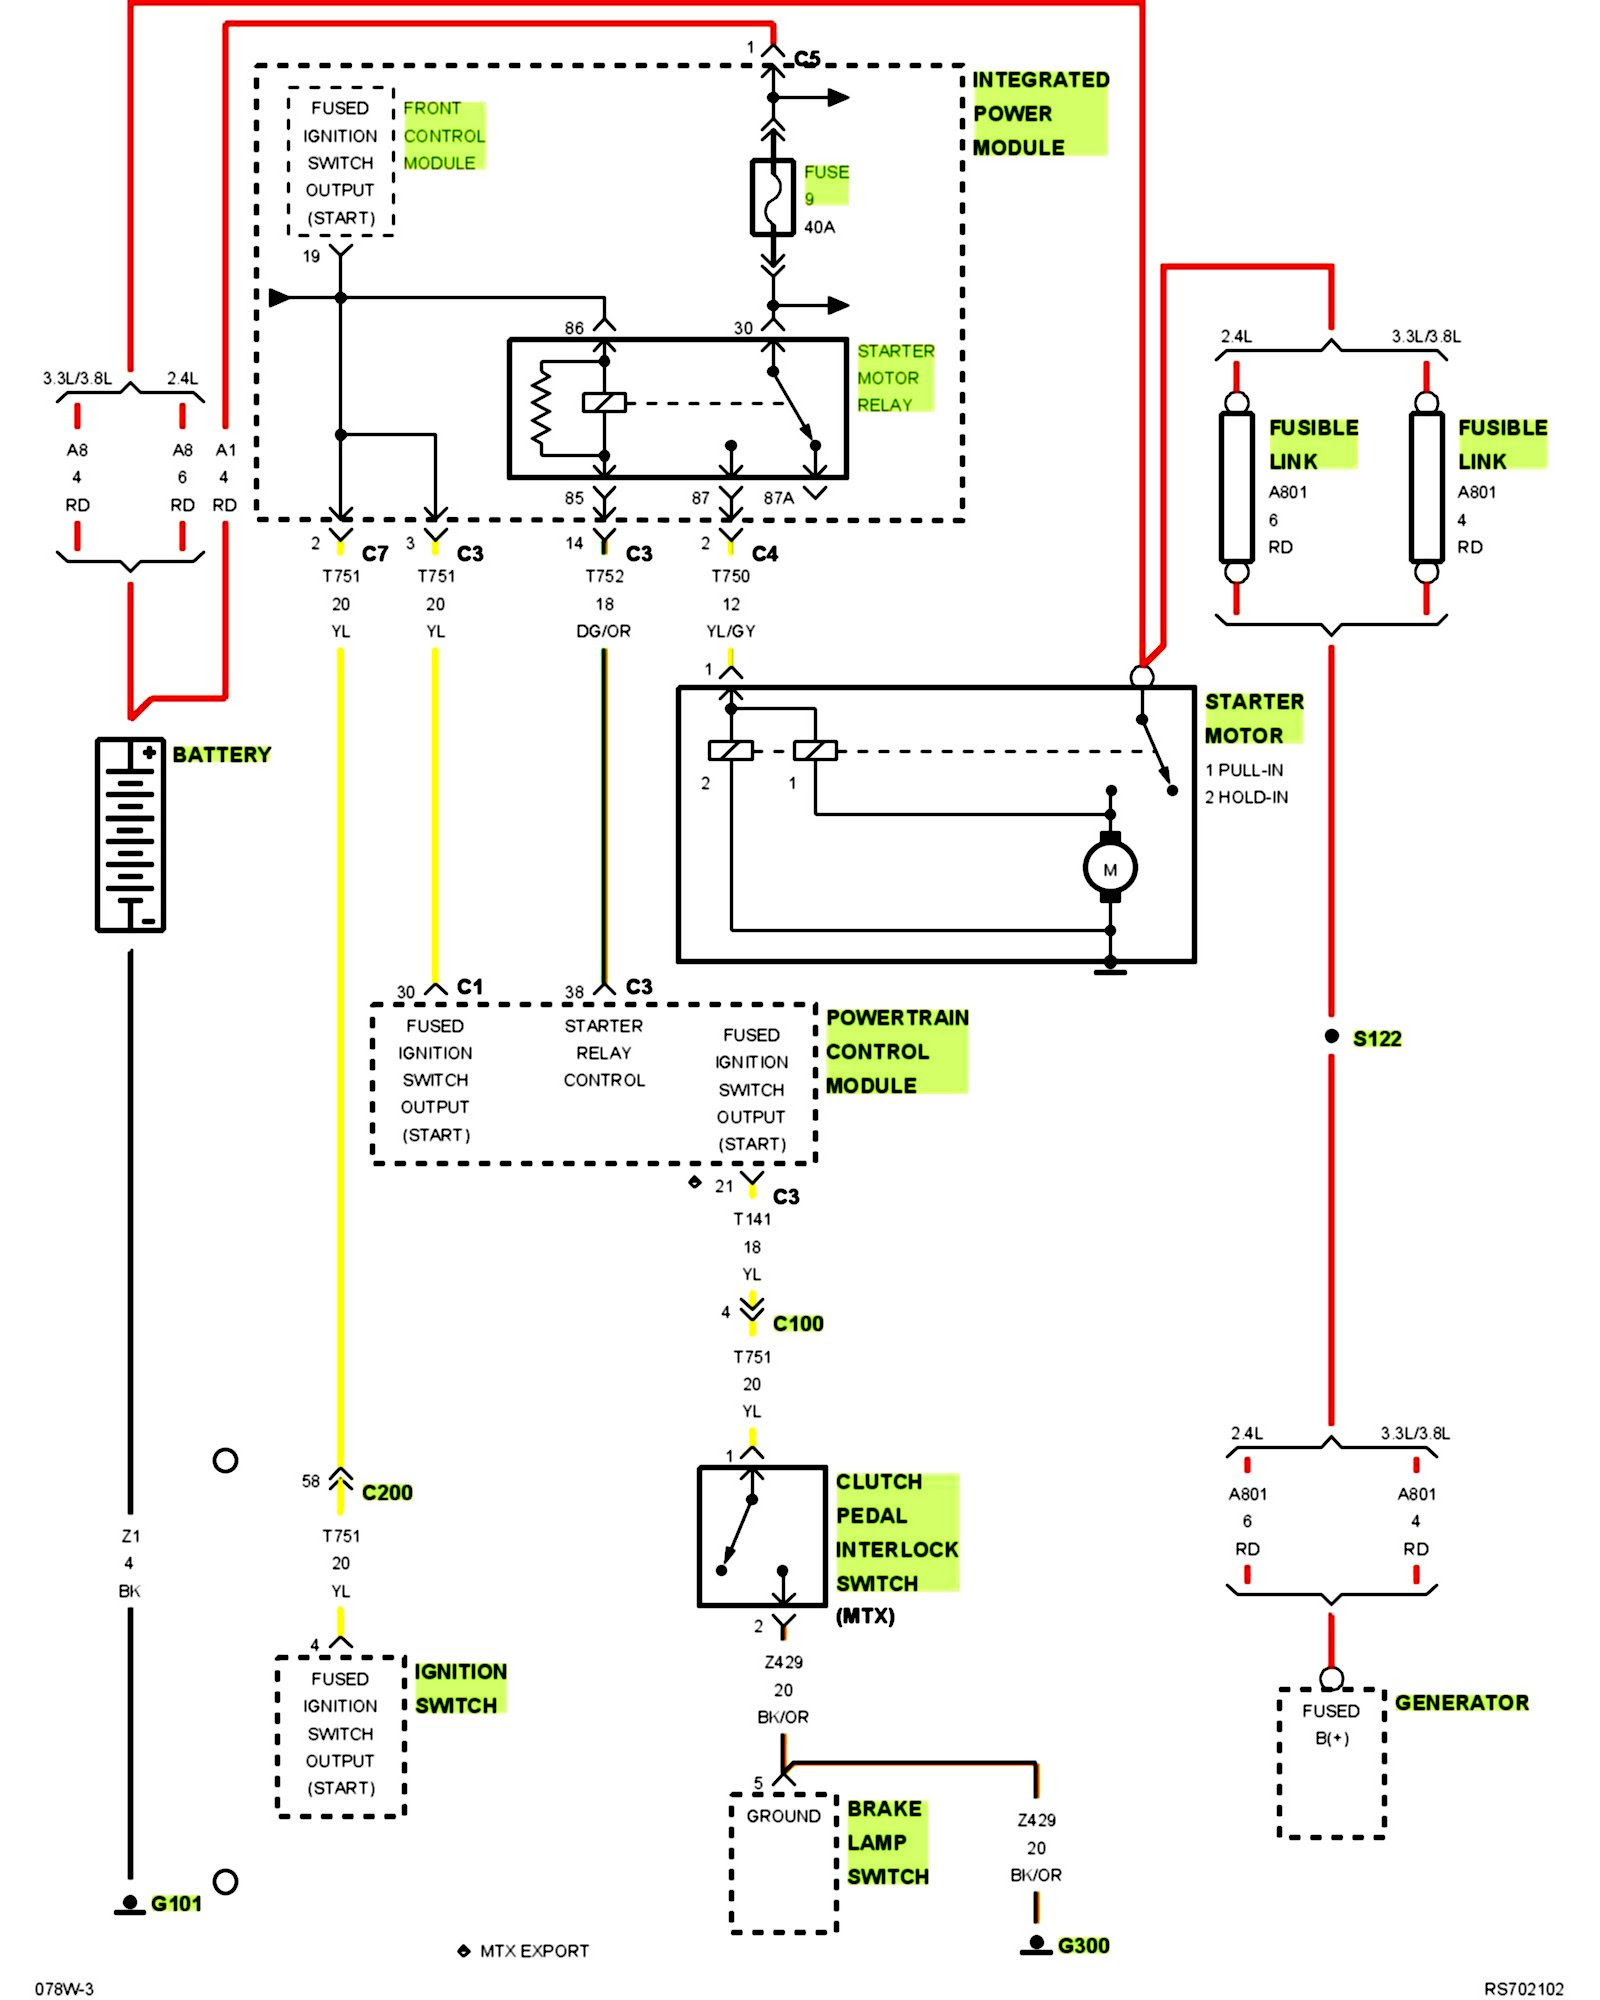 Diagram 2011 Caravan Wiring Diagram Full Version Hd Quality Wiring Diagram Diagrammatix Bioareste It